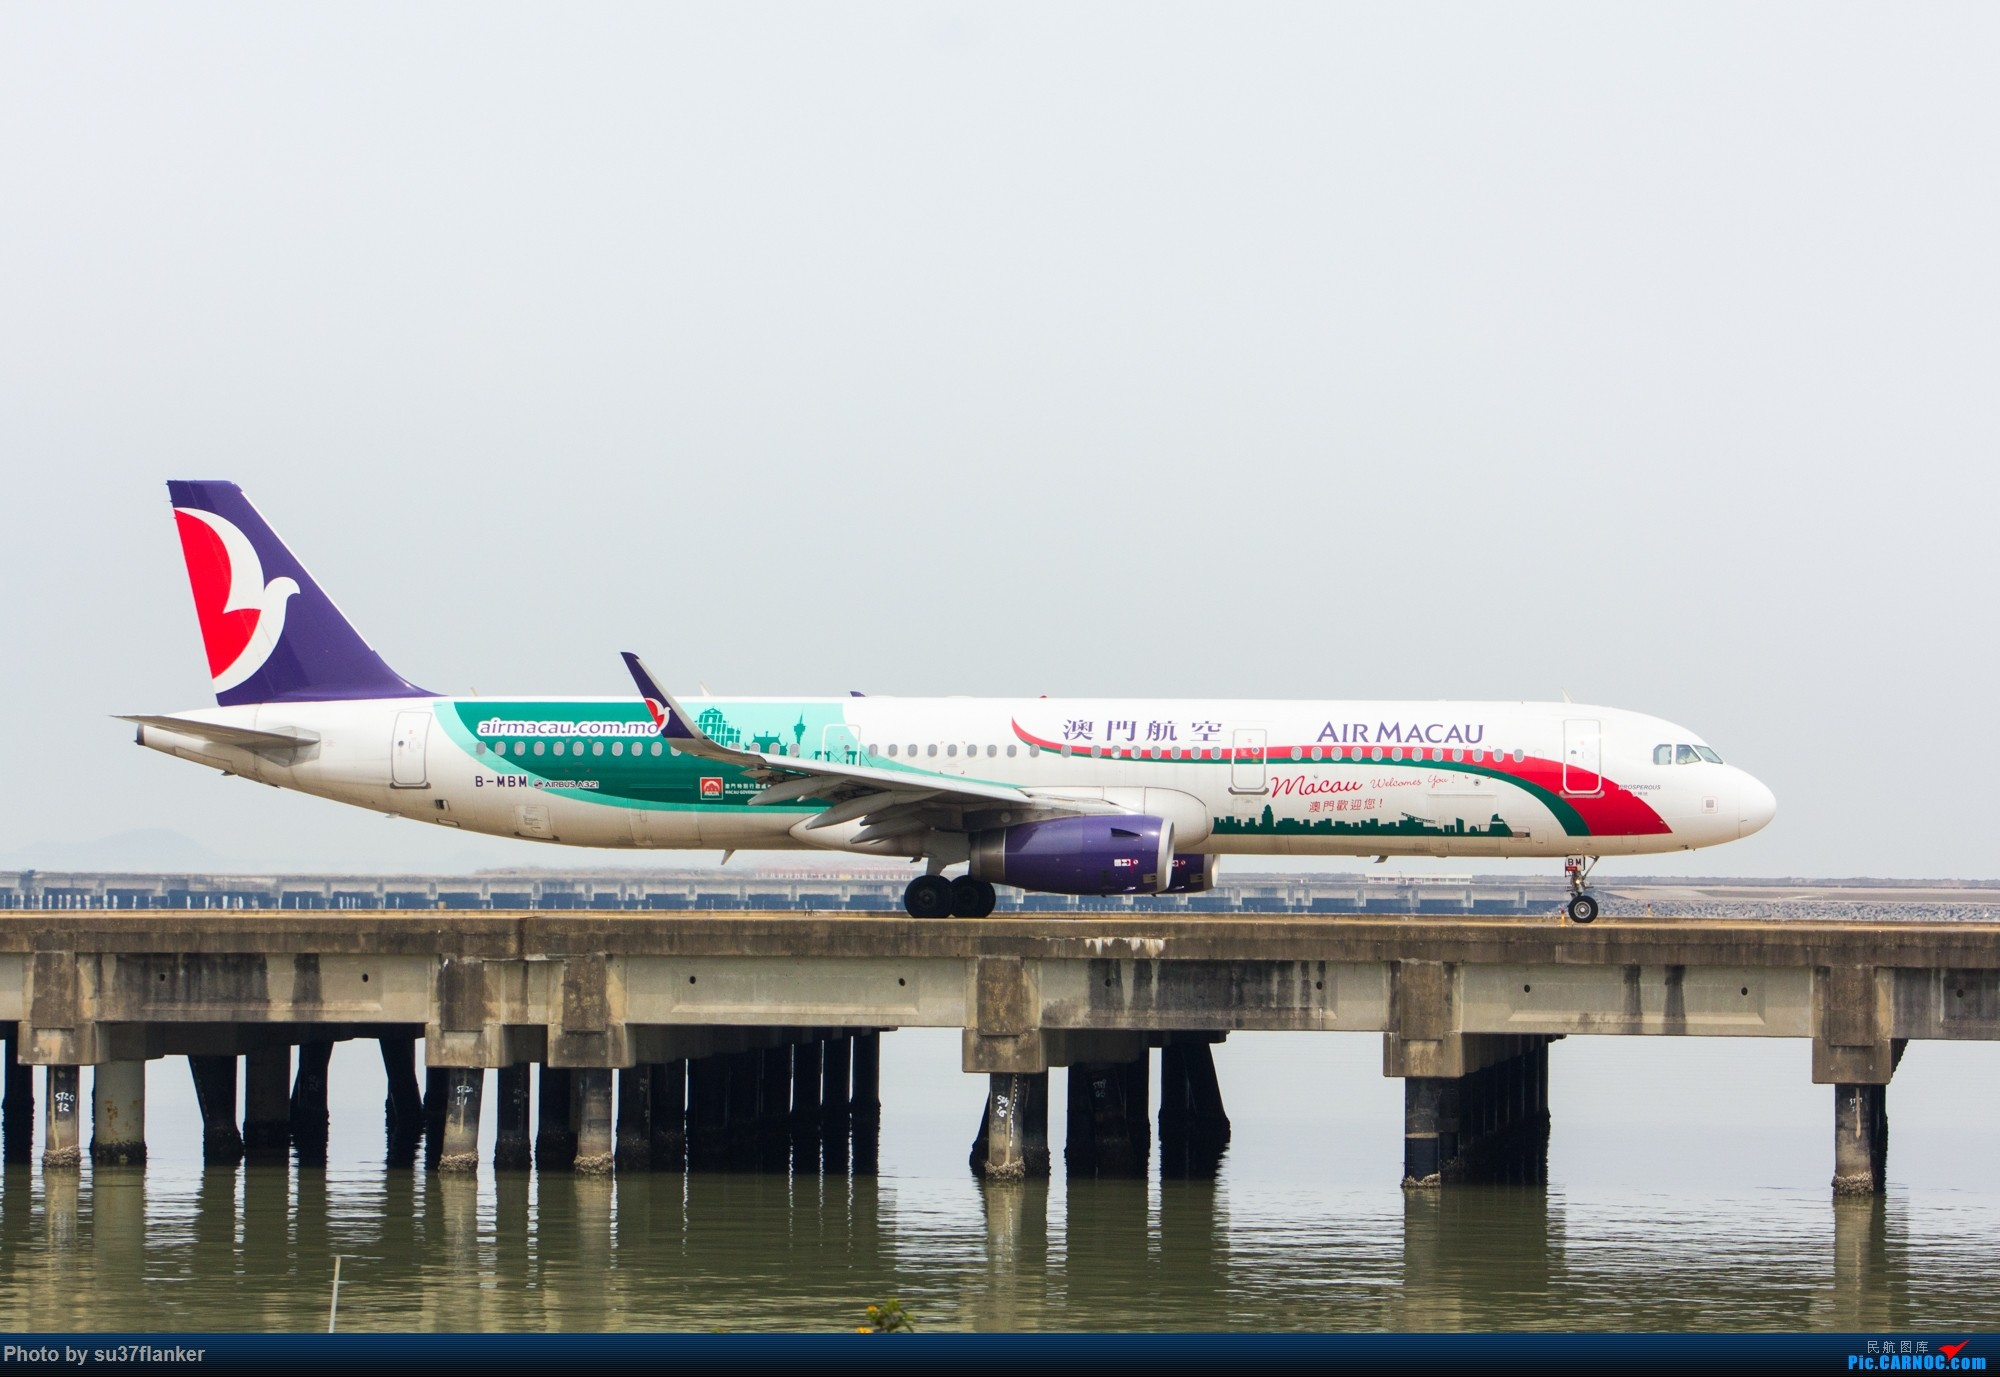 Re:[原创]【MFM】澳门机场拍机,多图多公司 AIRBUS A321-200 B-MBM 中国澳门国际机场